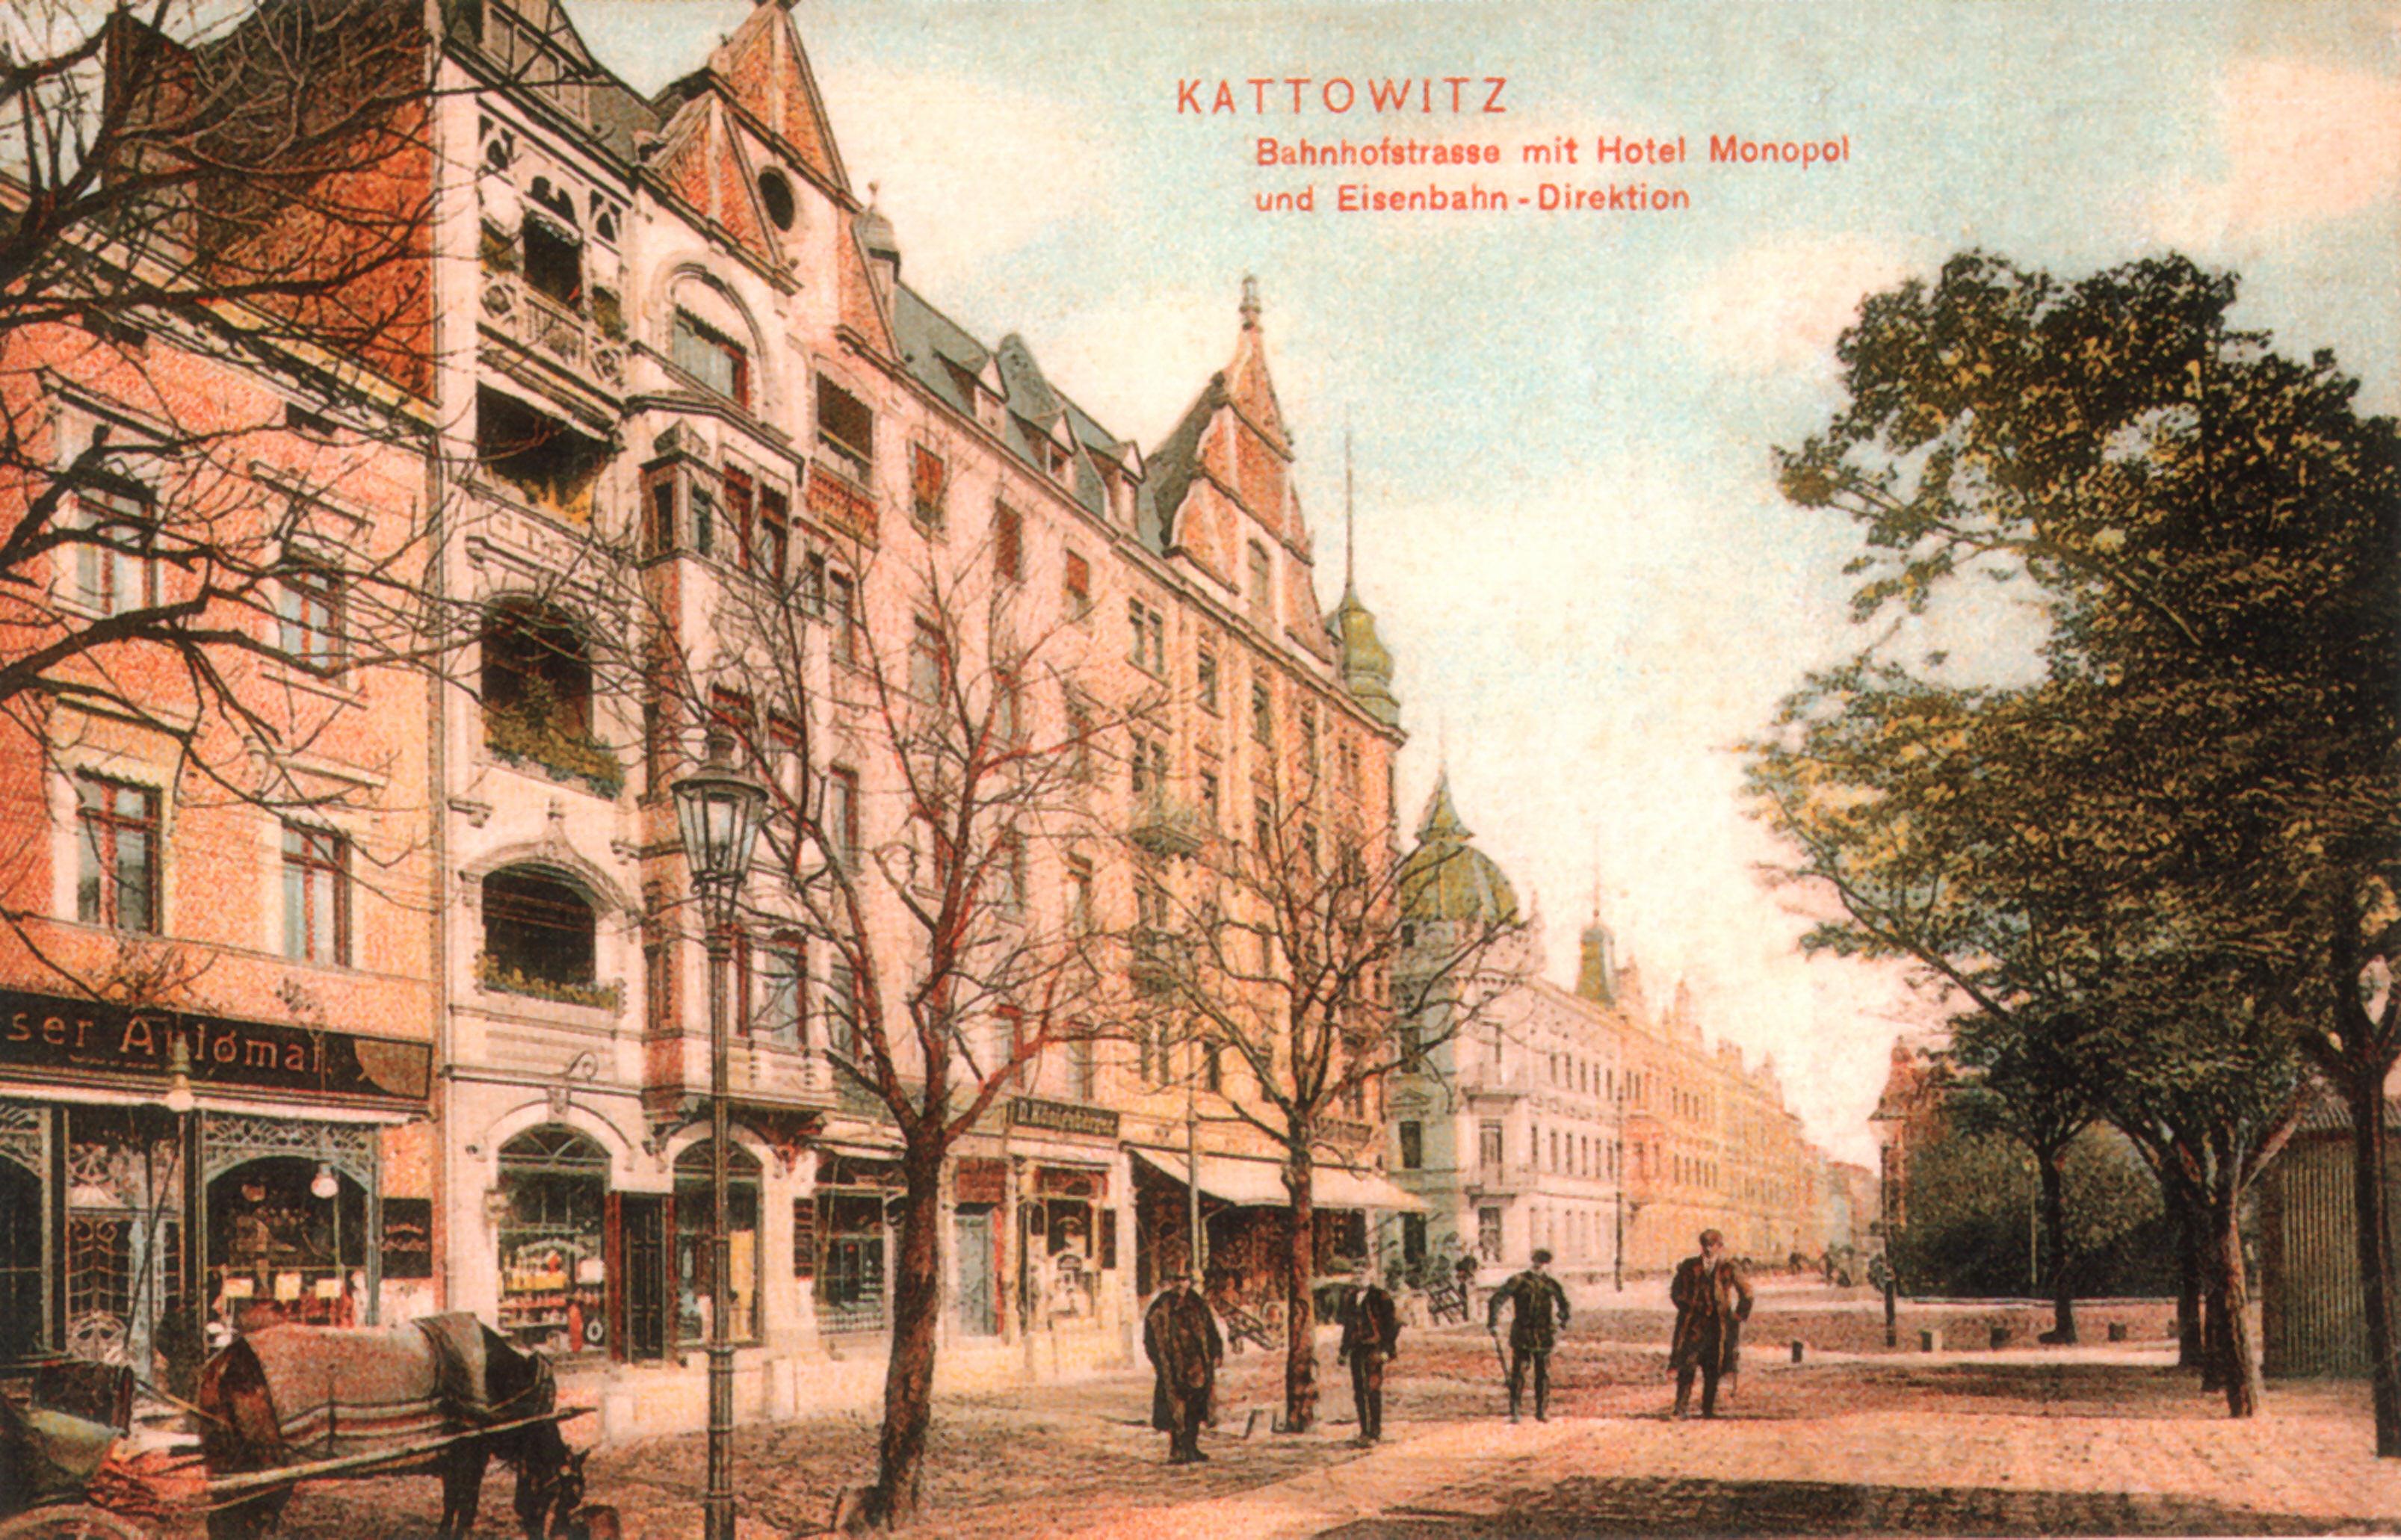 Kattowitz